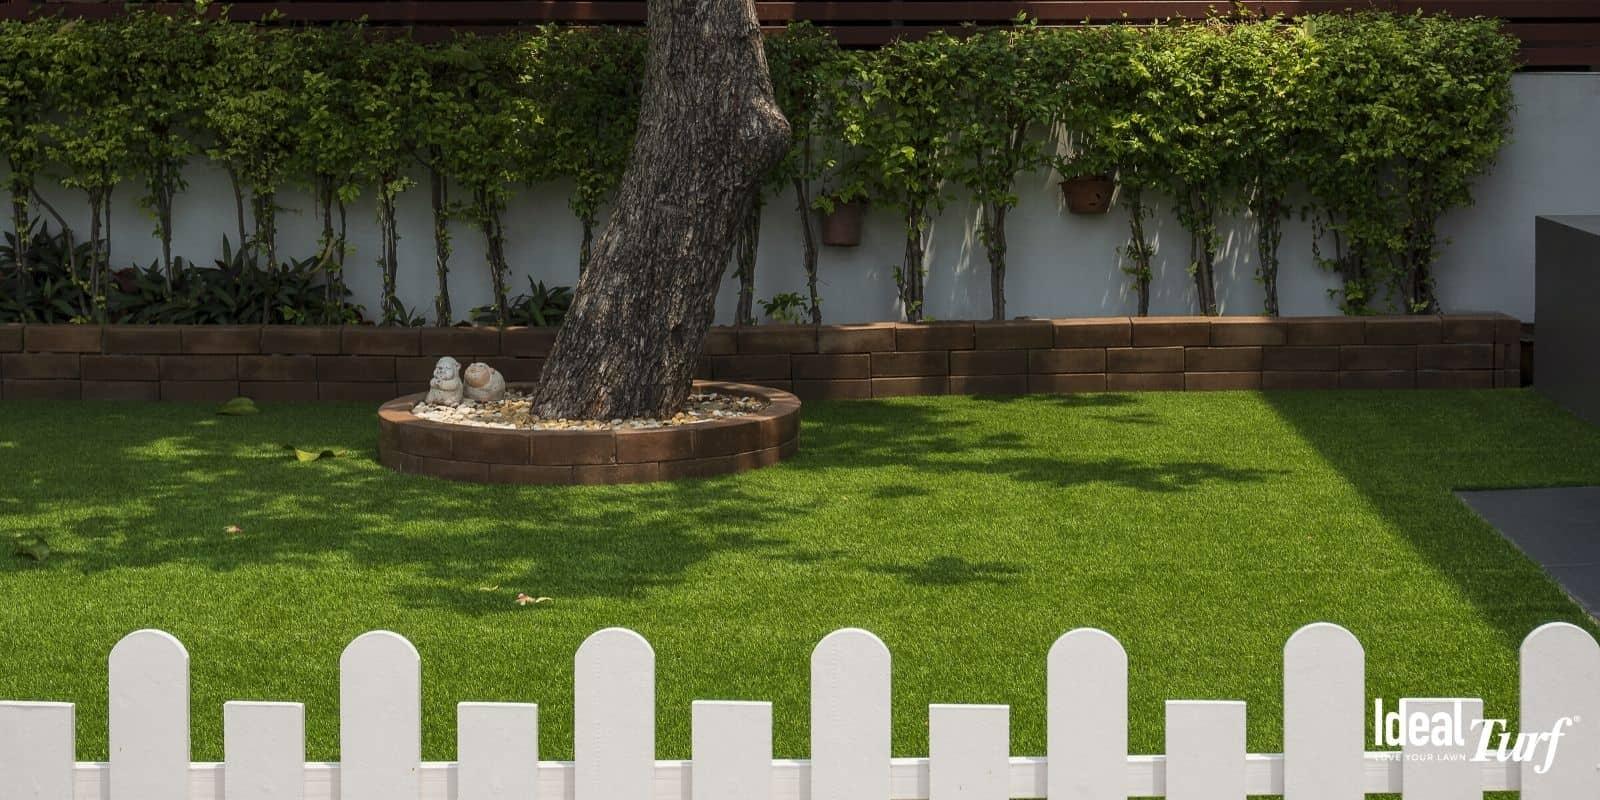 Dog Run Ideas: The Definitive Guide To Pet-Friendly Backyard Dog Potty Areas 1